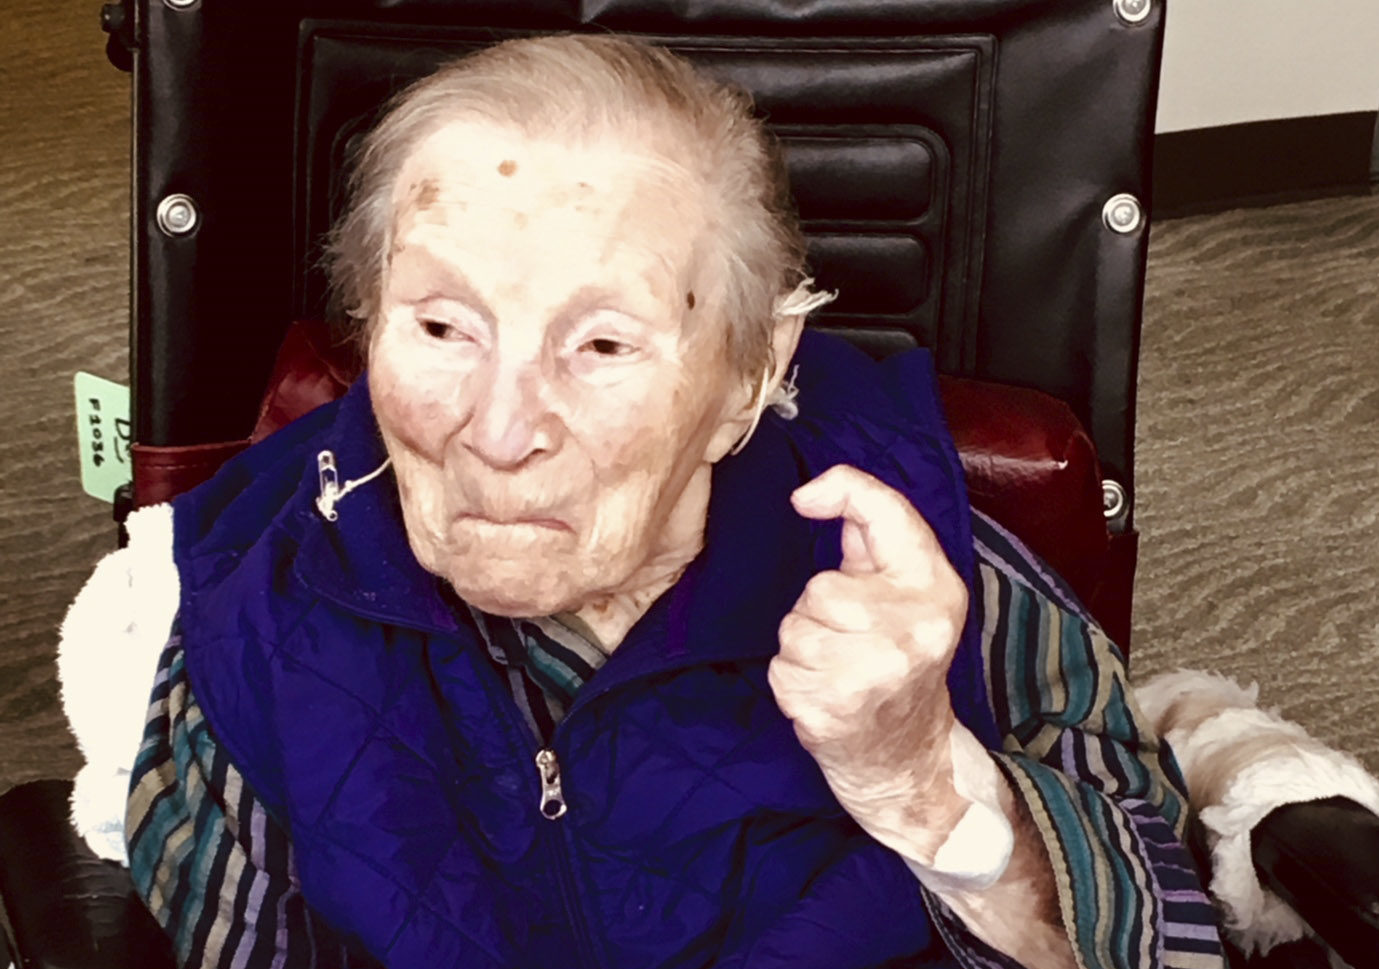 Doris Sperber at her 110th birthday party, Jan. 18, 2018  (Photo/Dan Pine)